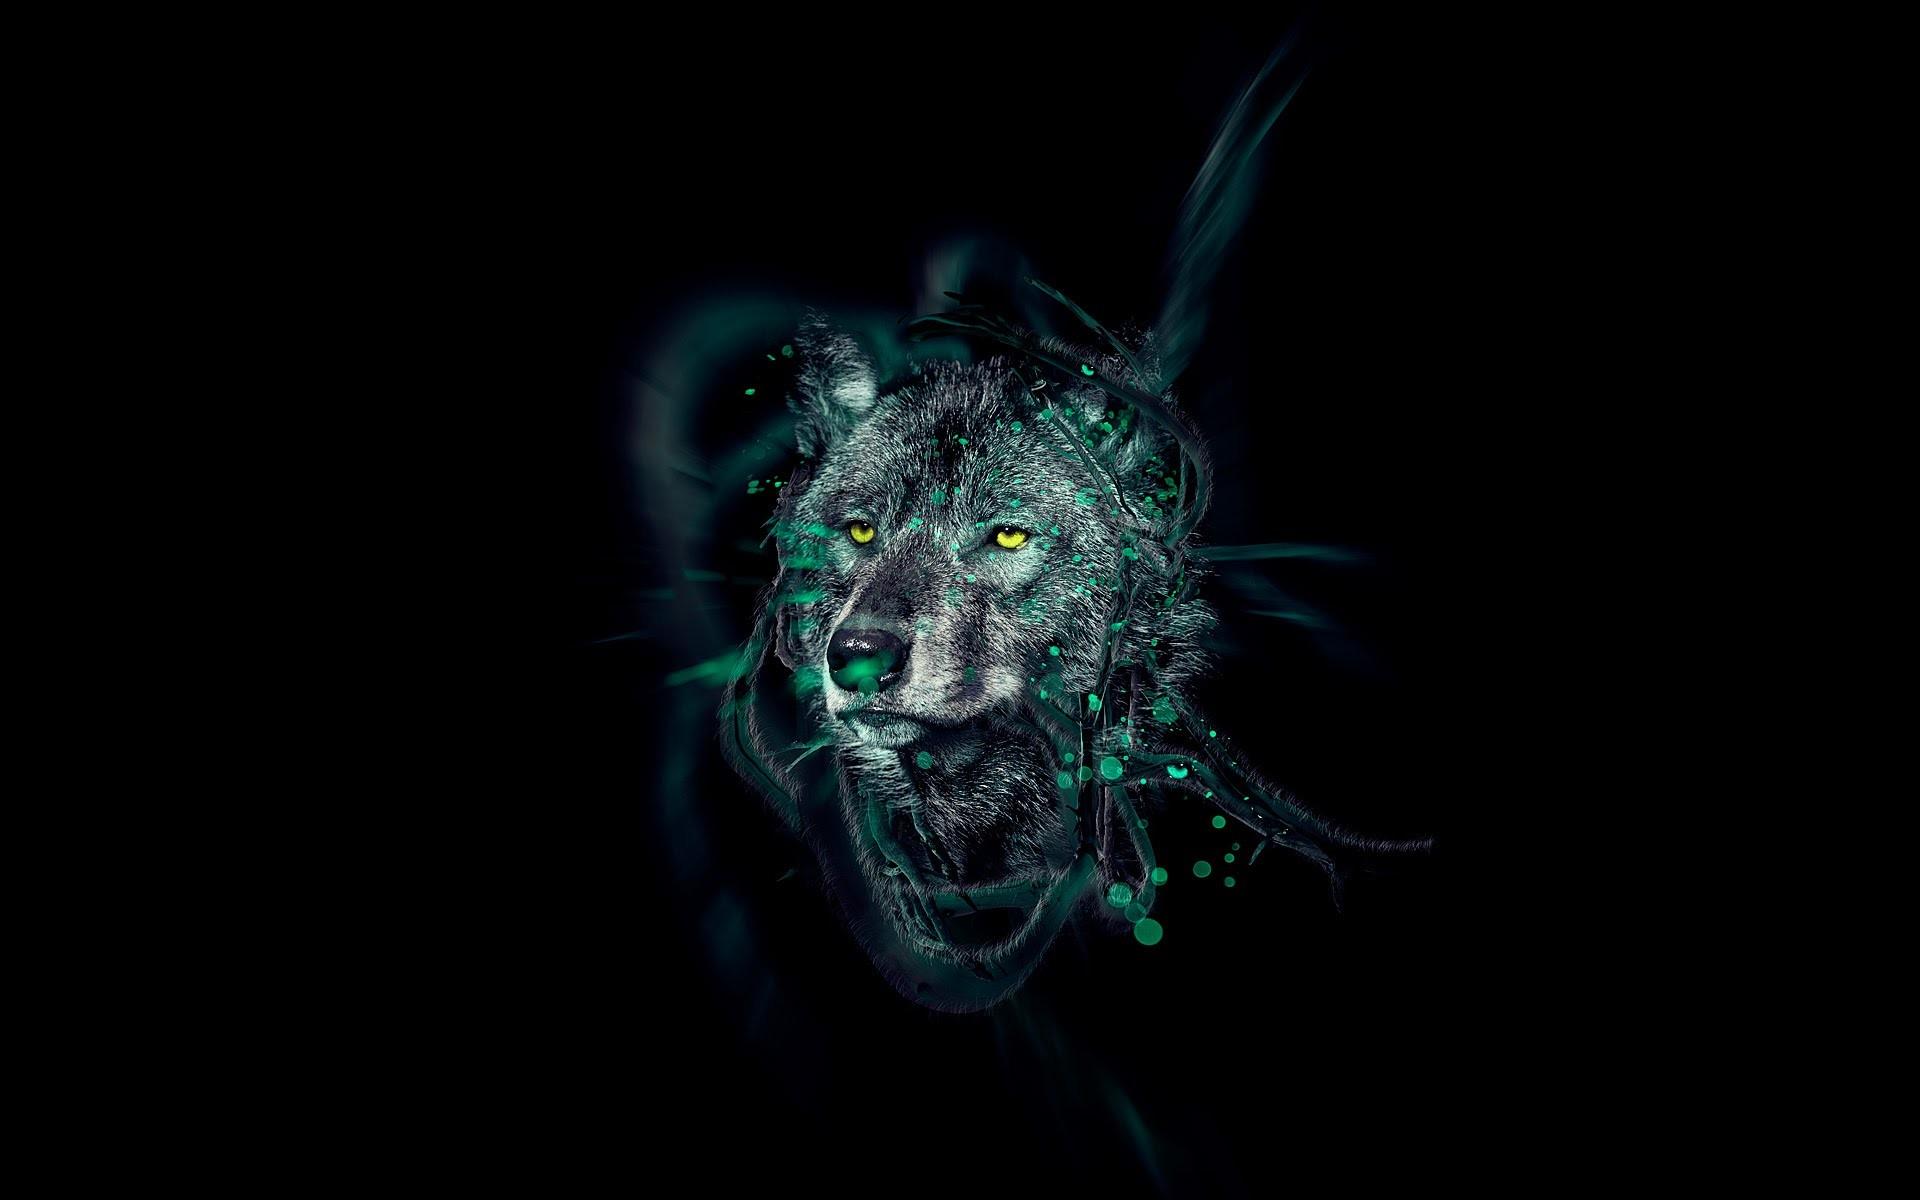 Black wolf wallpaper hd HD Wallpapers Pinterest Wolf